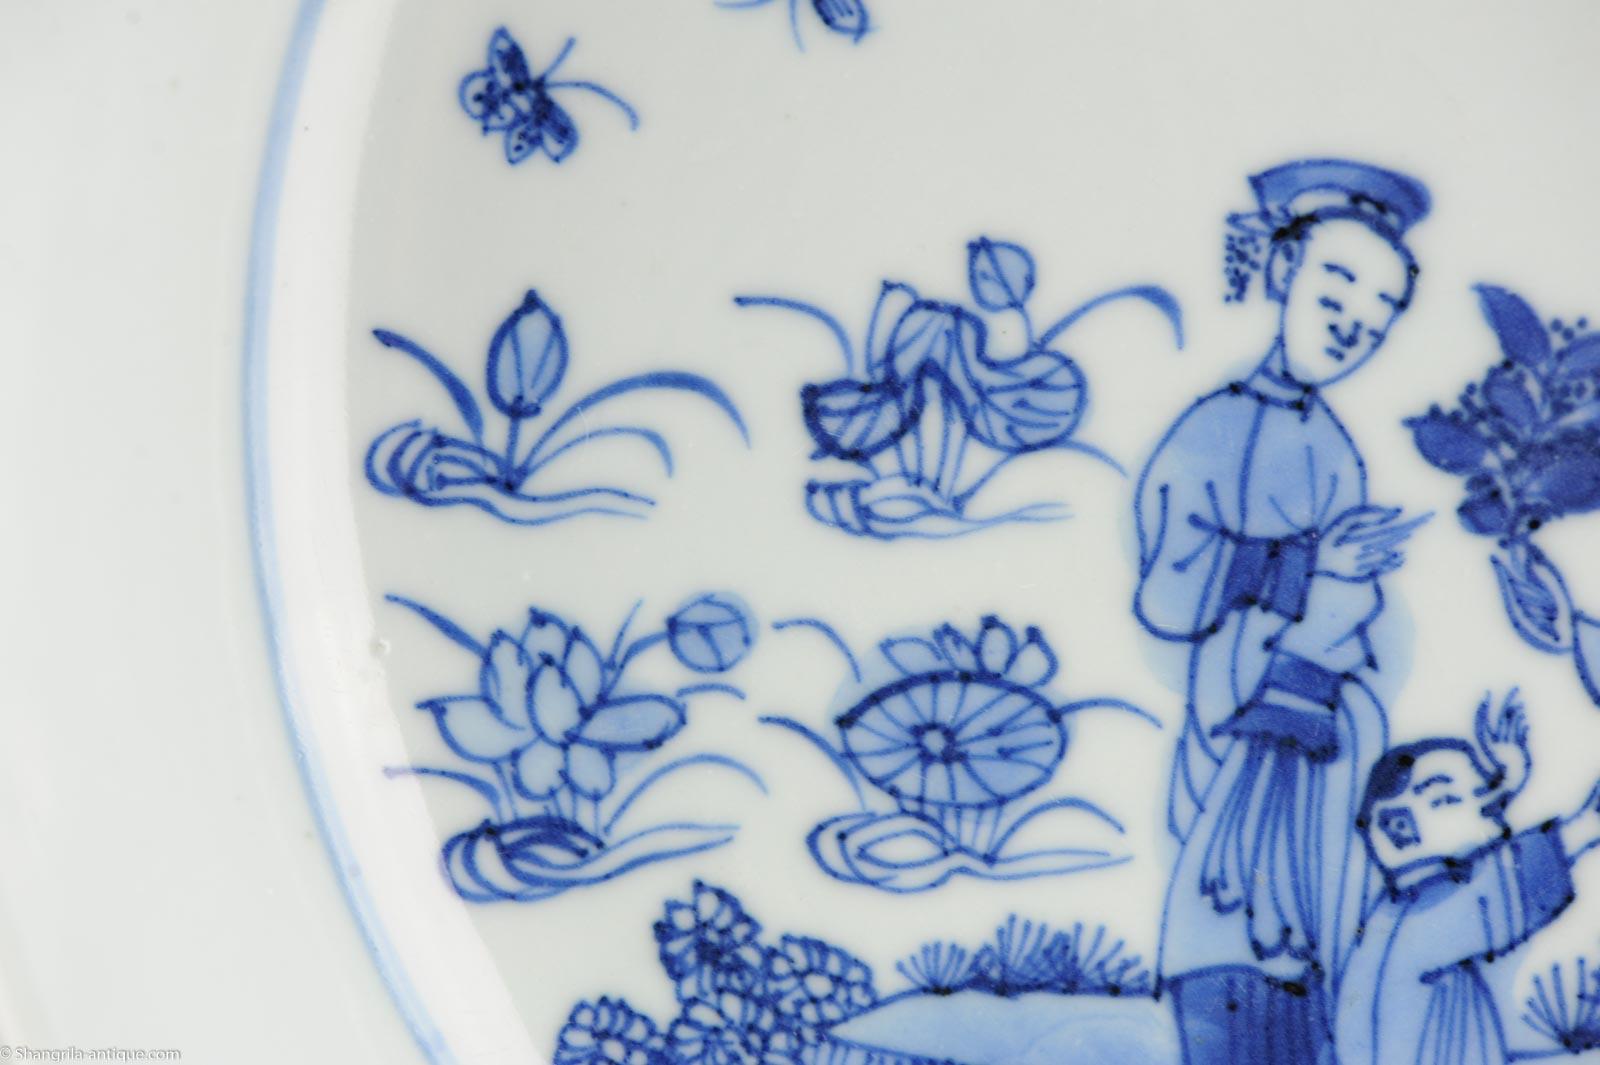 Identifying Chinese Porcelain and Ceramics